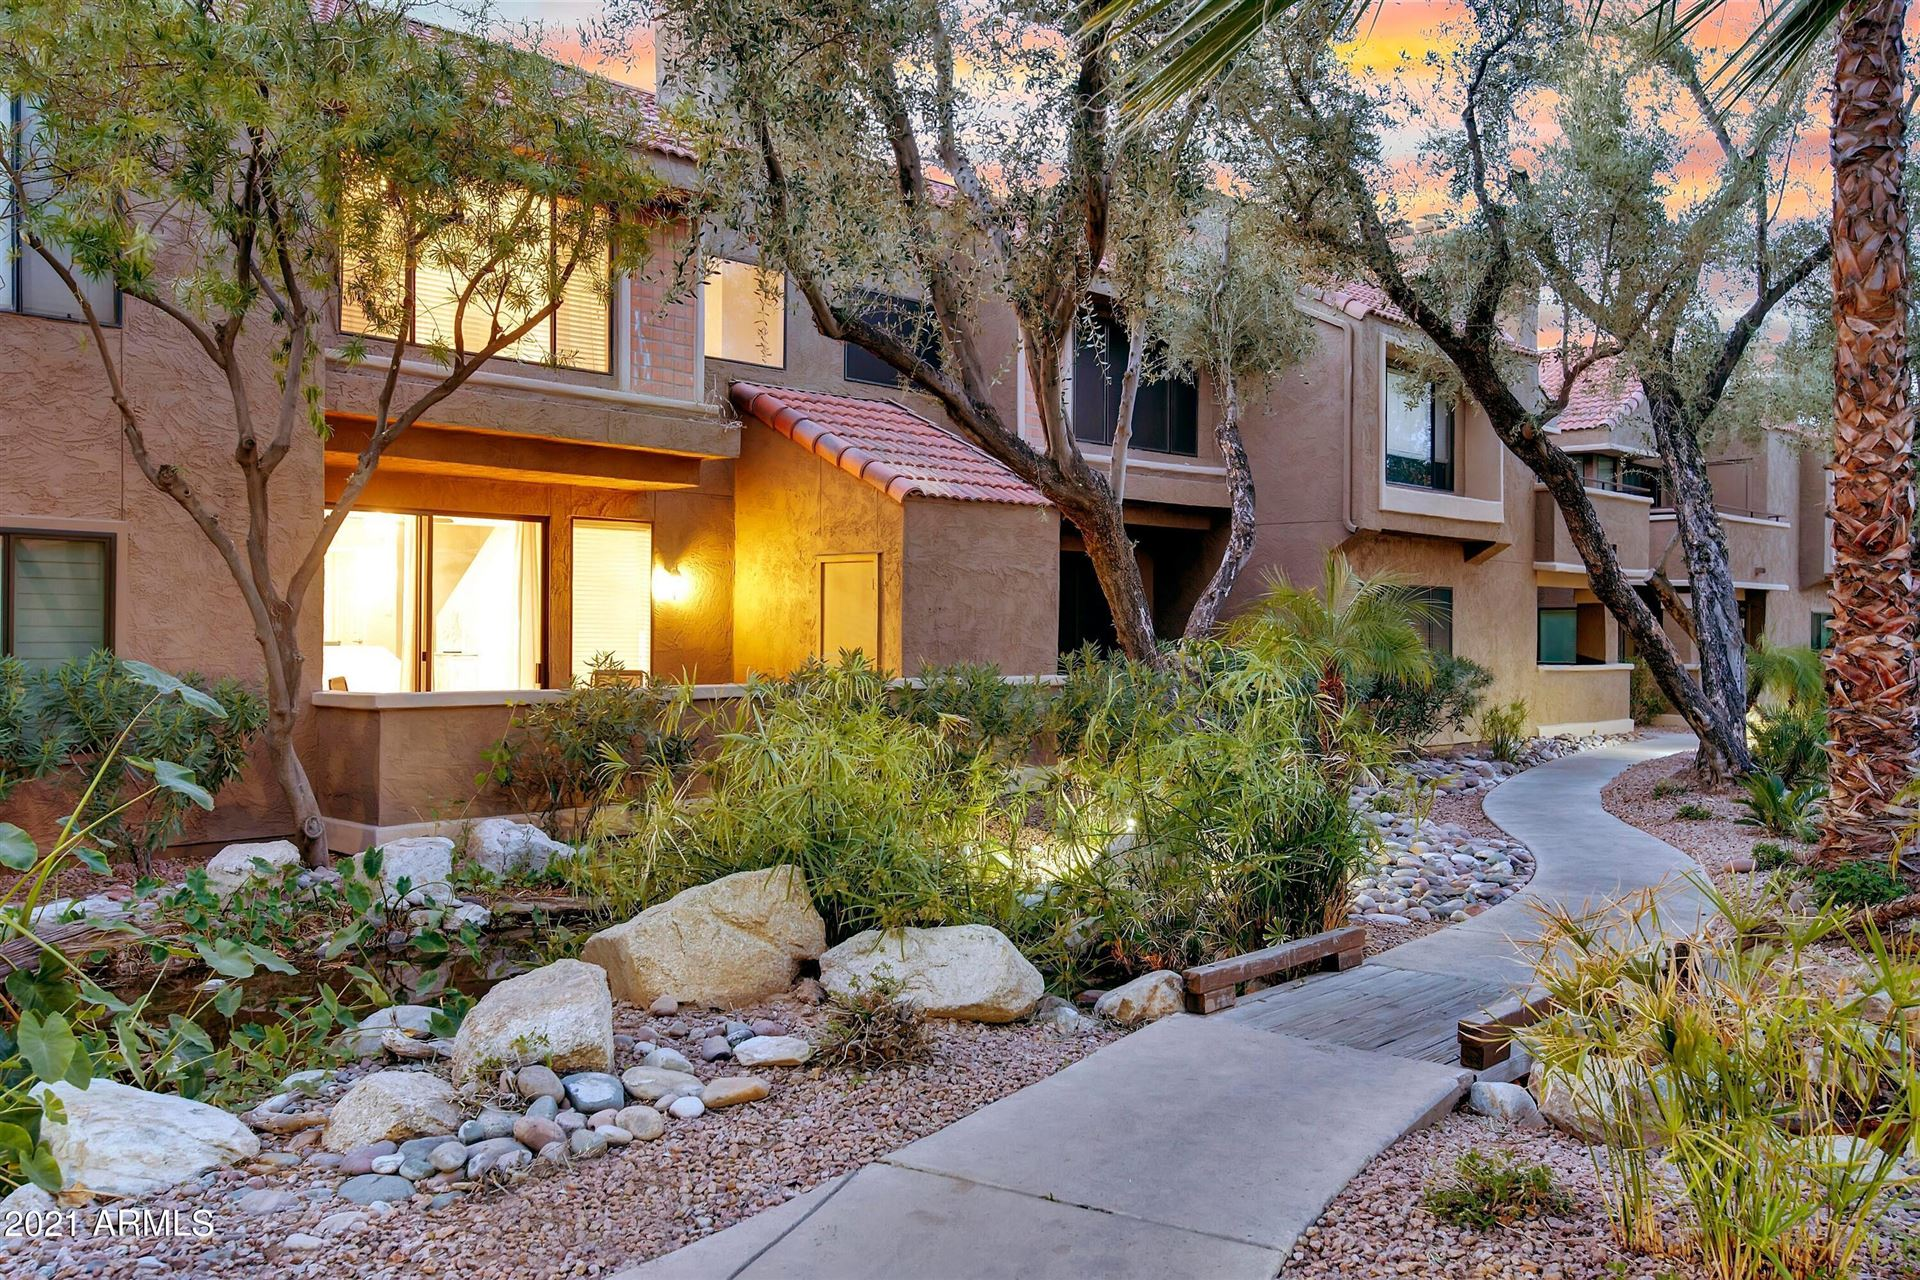 Photo of 5122 E SHEA Boulevard #1142, Scottsdale, AZ 85254 (MLS # 6200966)